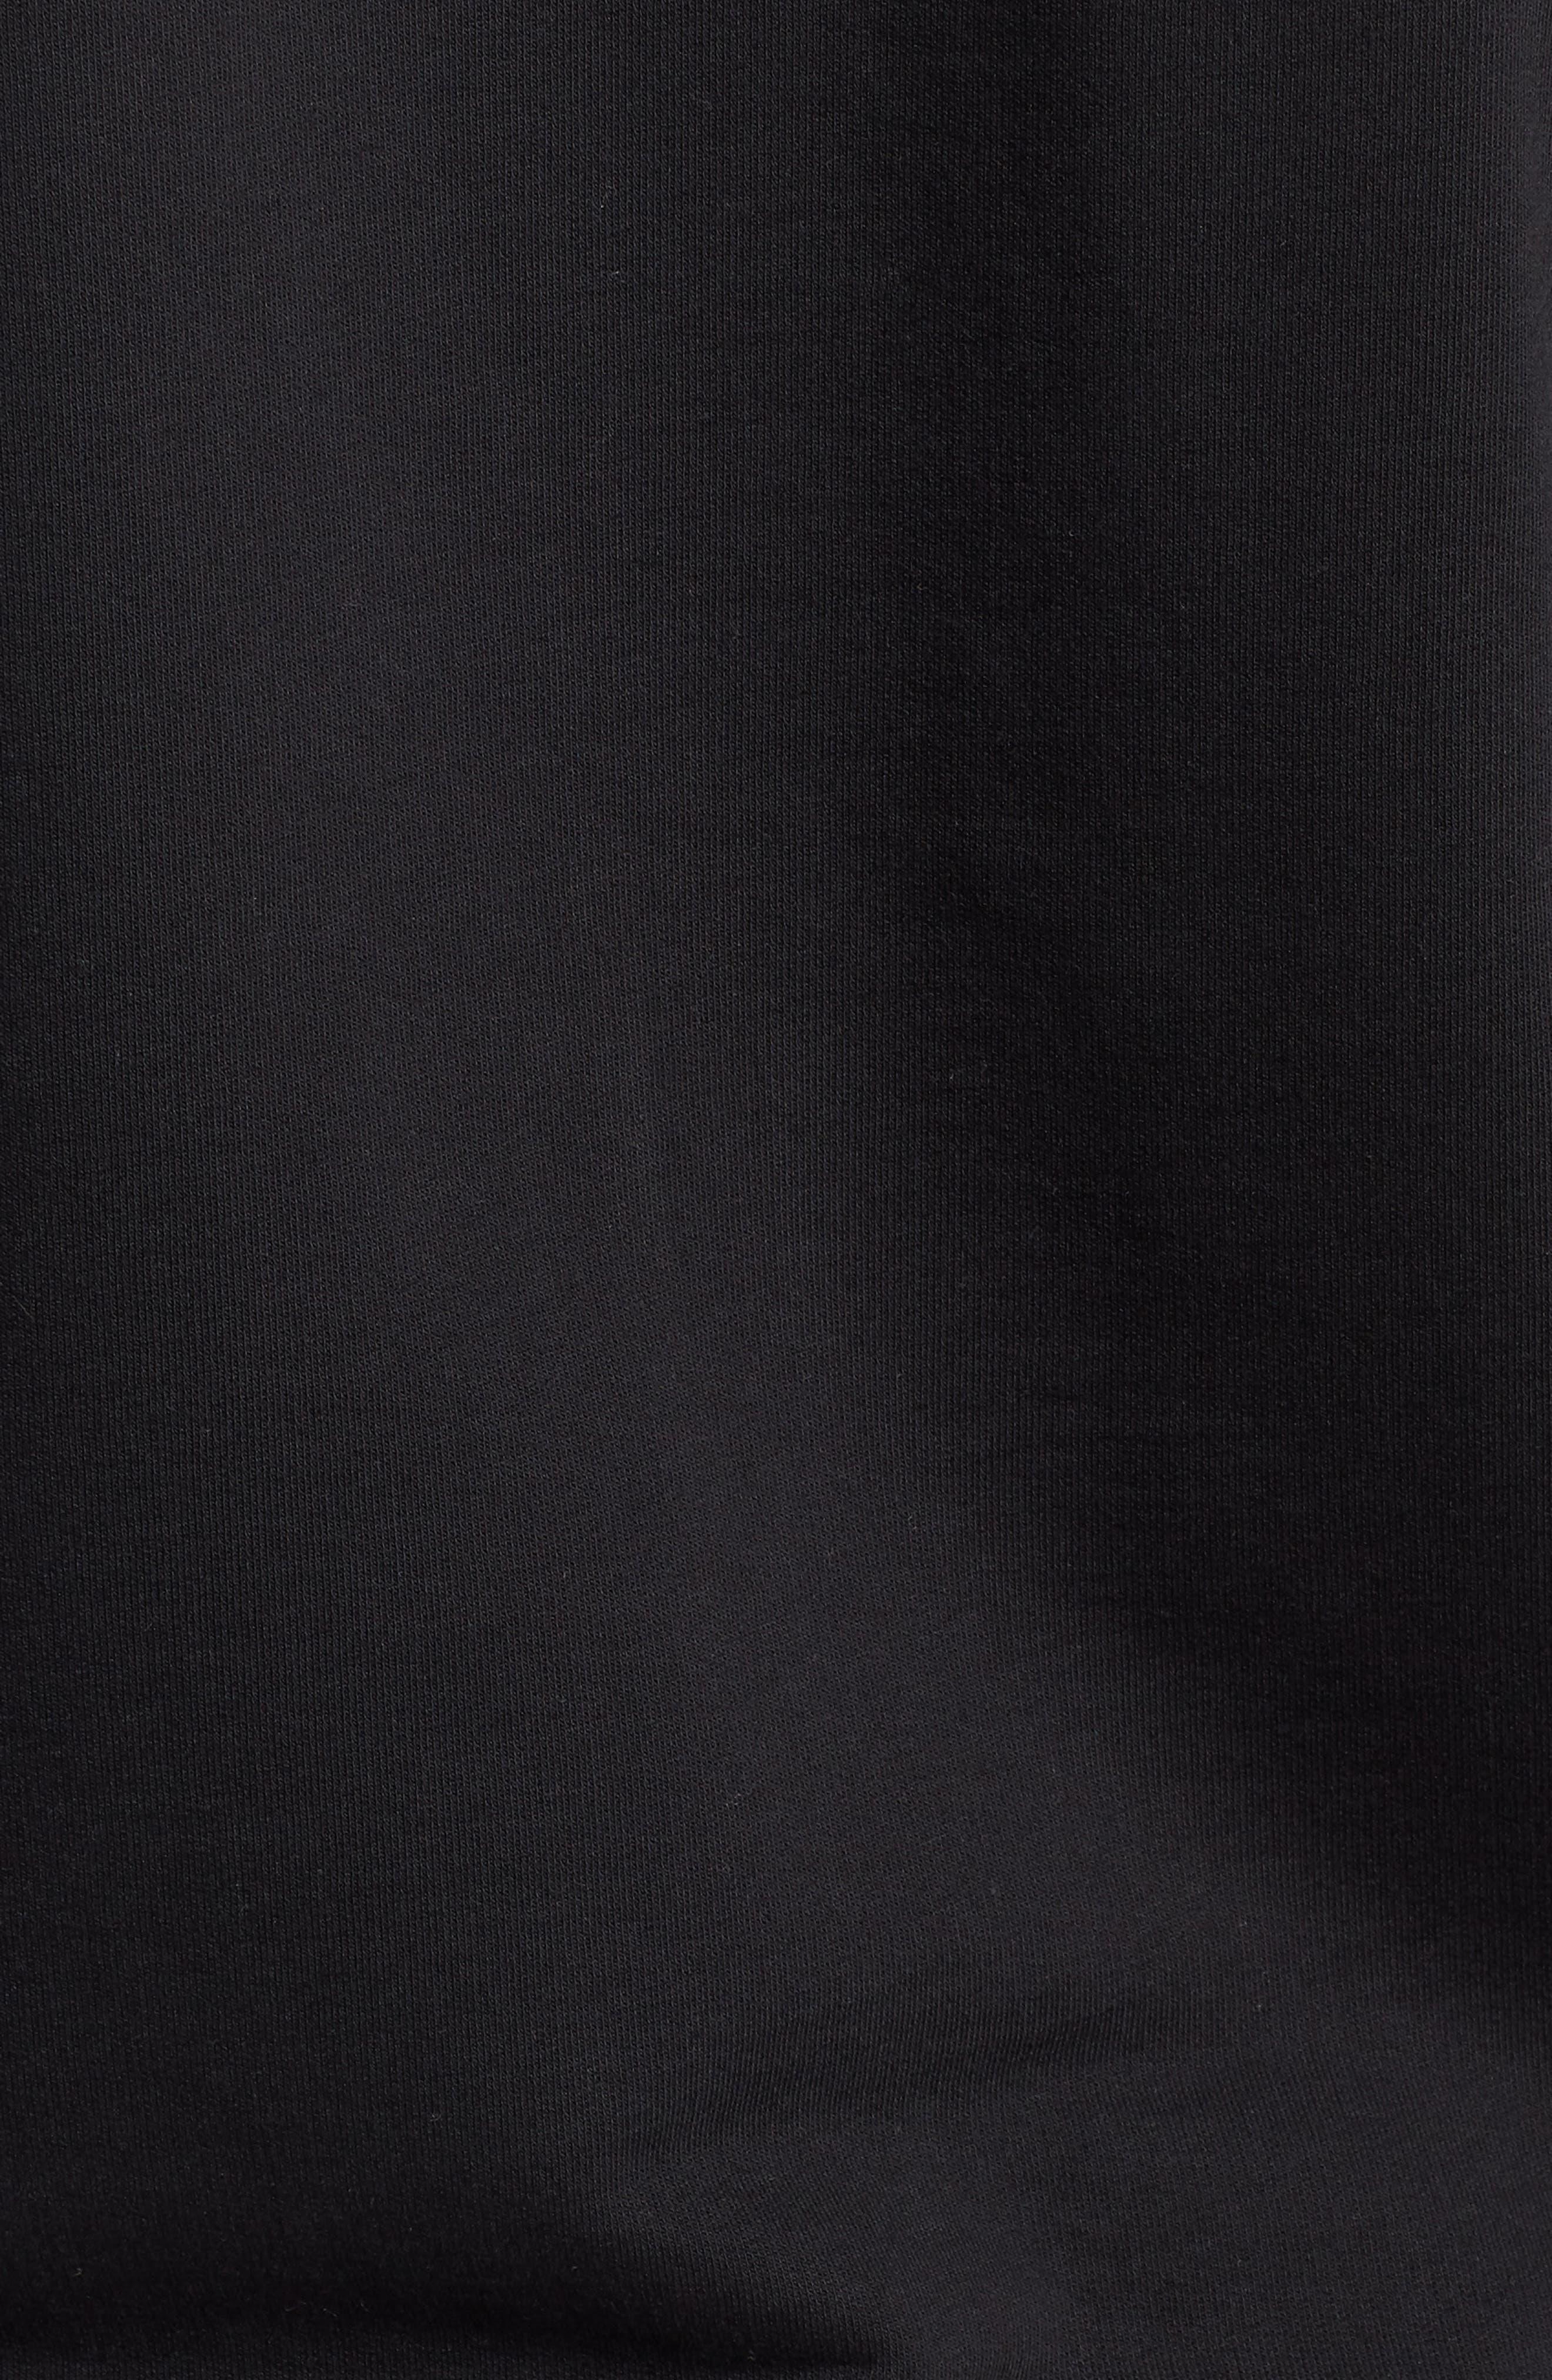 Regular Fit Hooded Fleece Jacket,                             Alternate thumbnail 5, color,                             Black